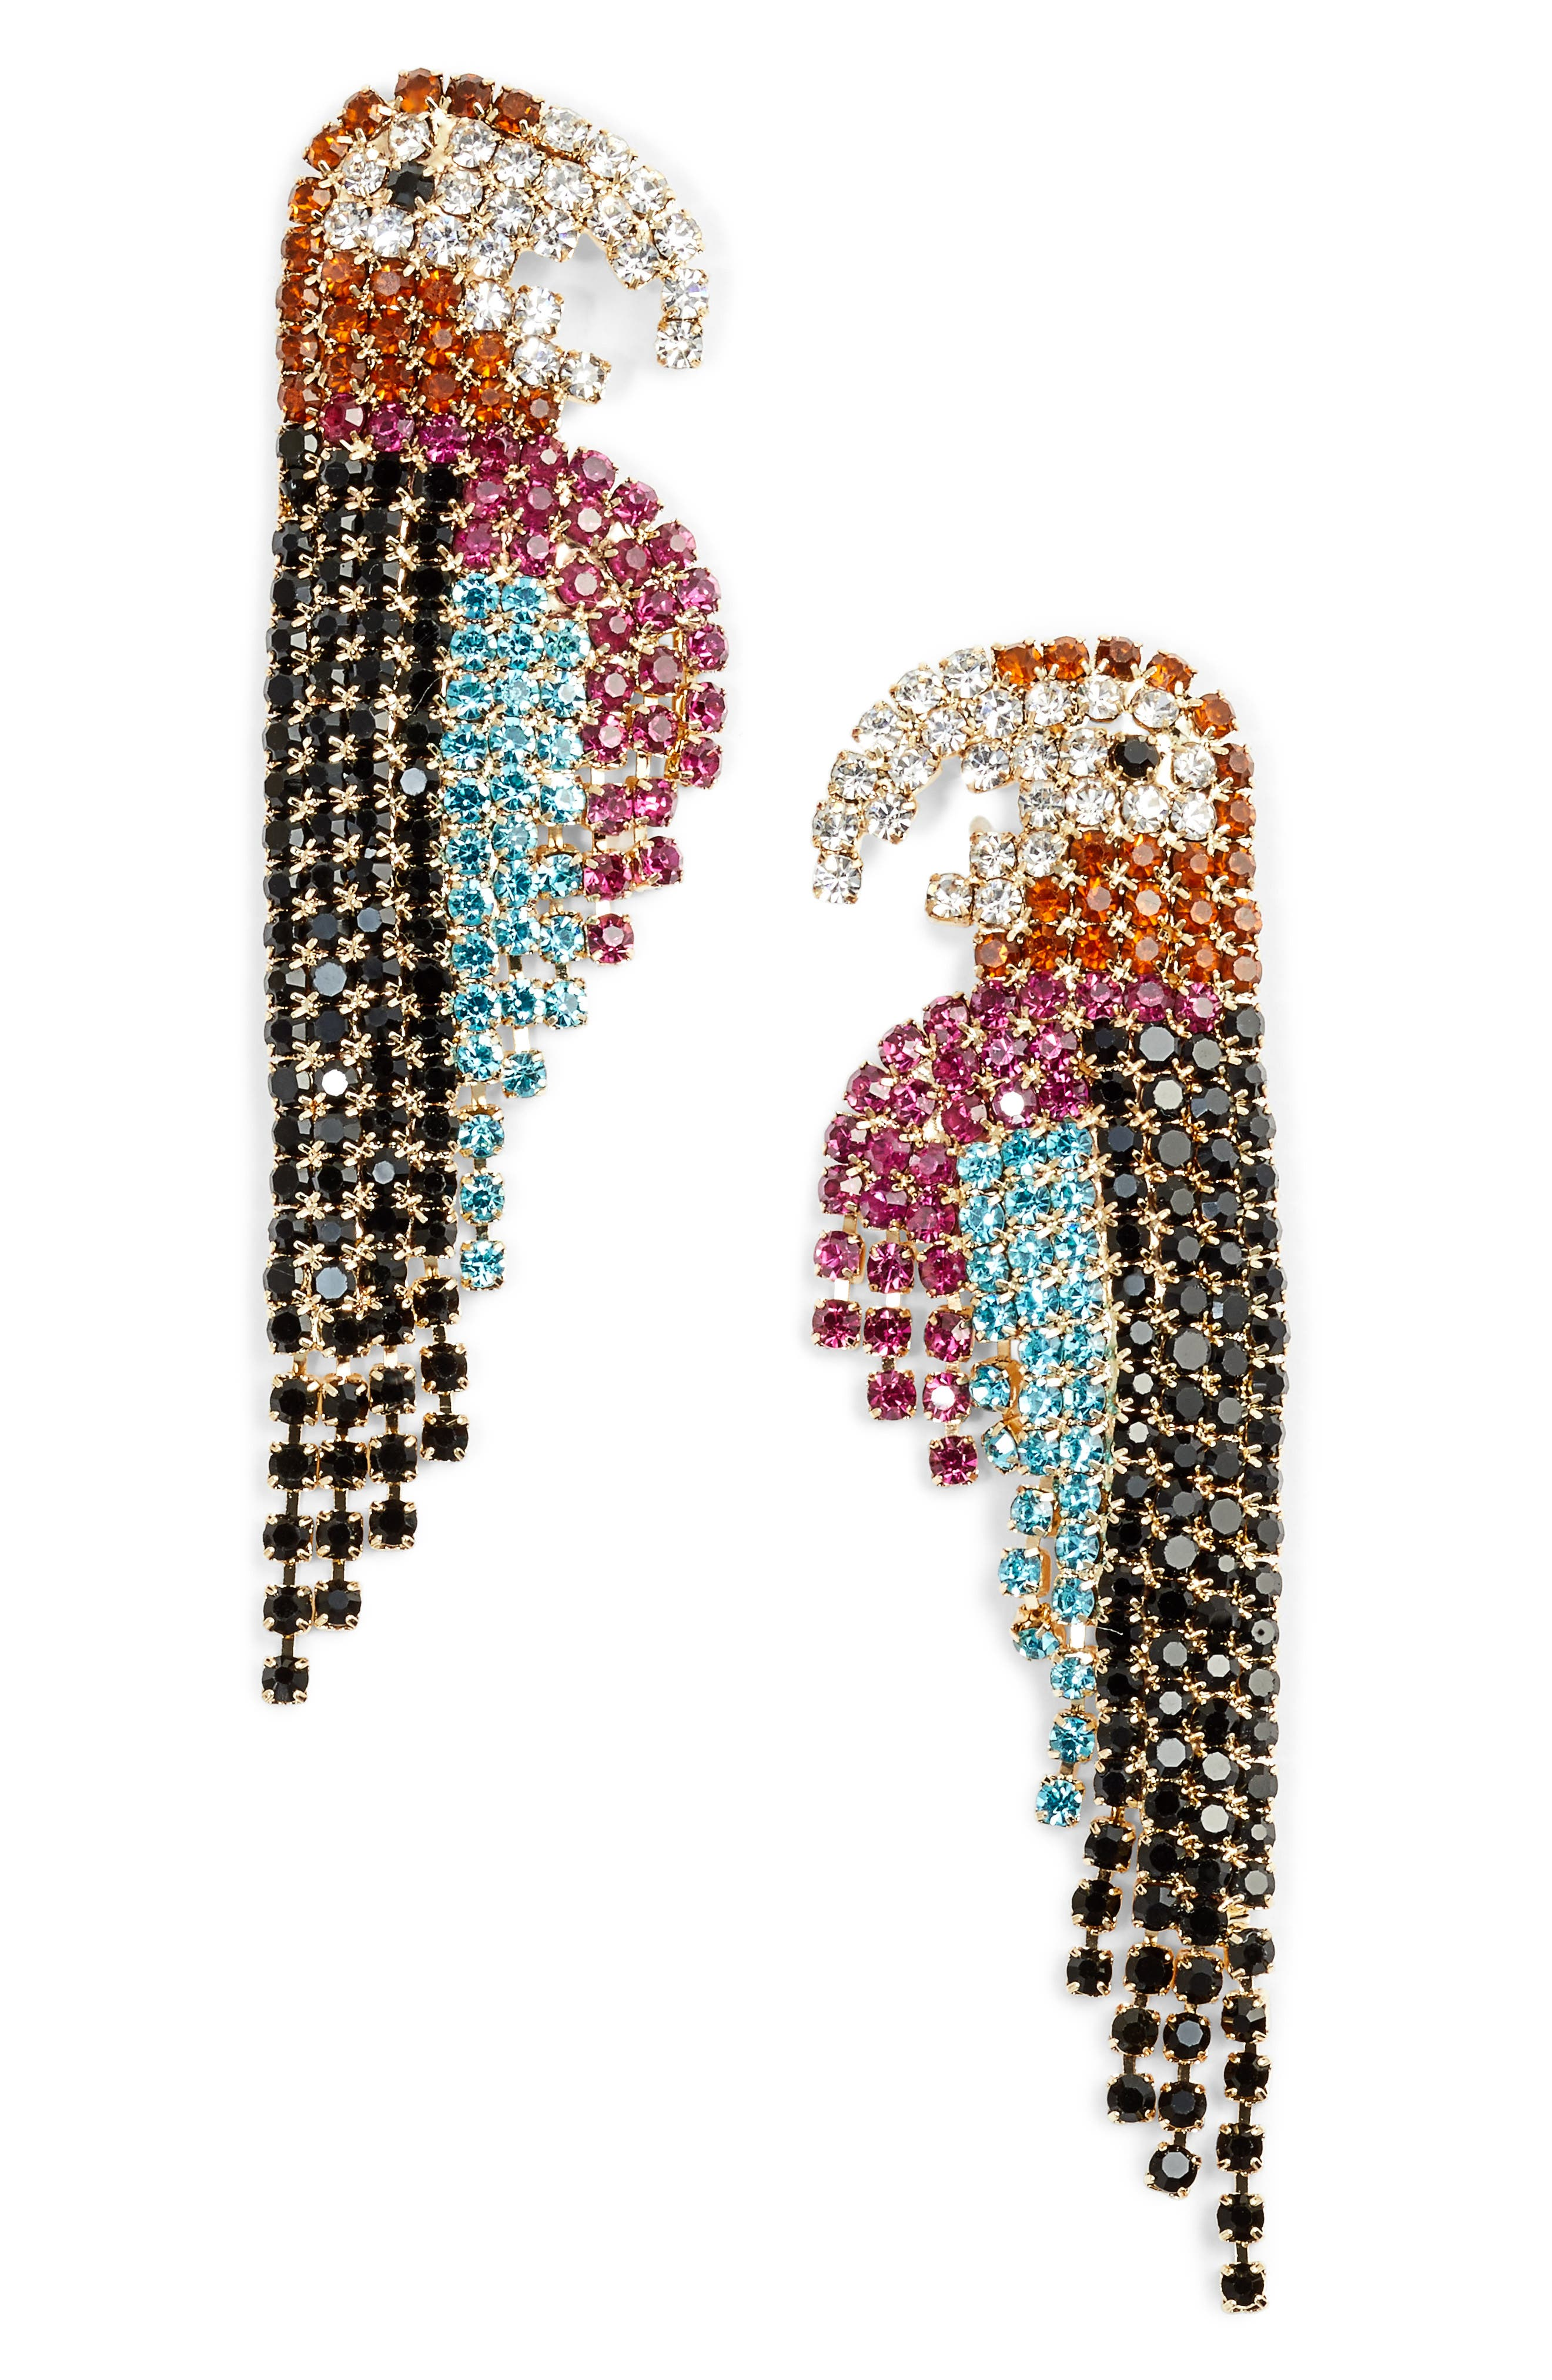 Polly Parrot Rhinestone Statement Earrings,                             Main thumbnail 1, color,                             MULTI